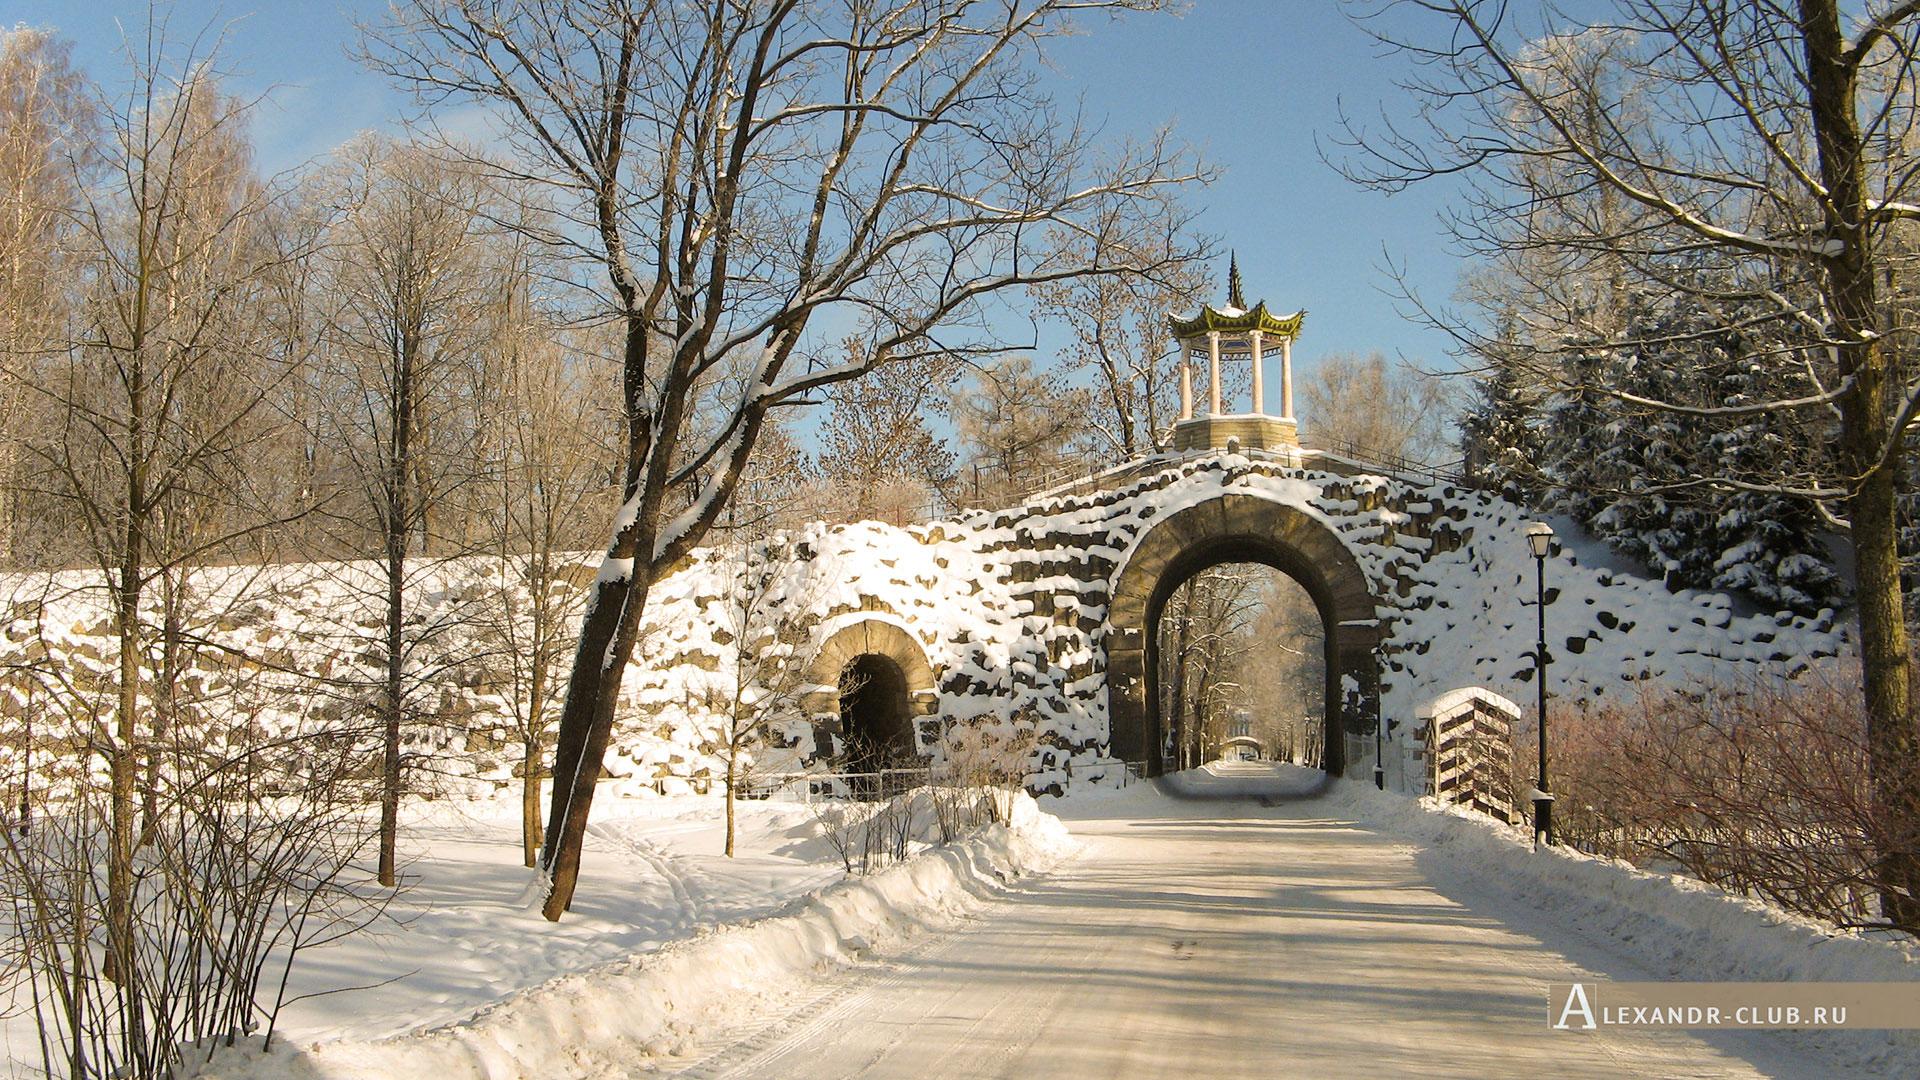 Пушкин, Царское Село, зима, Александровский парк, Большой каприз